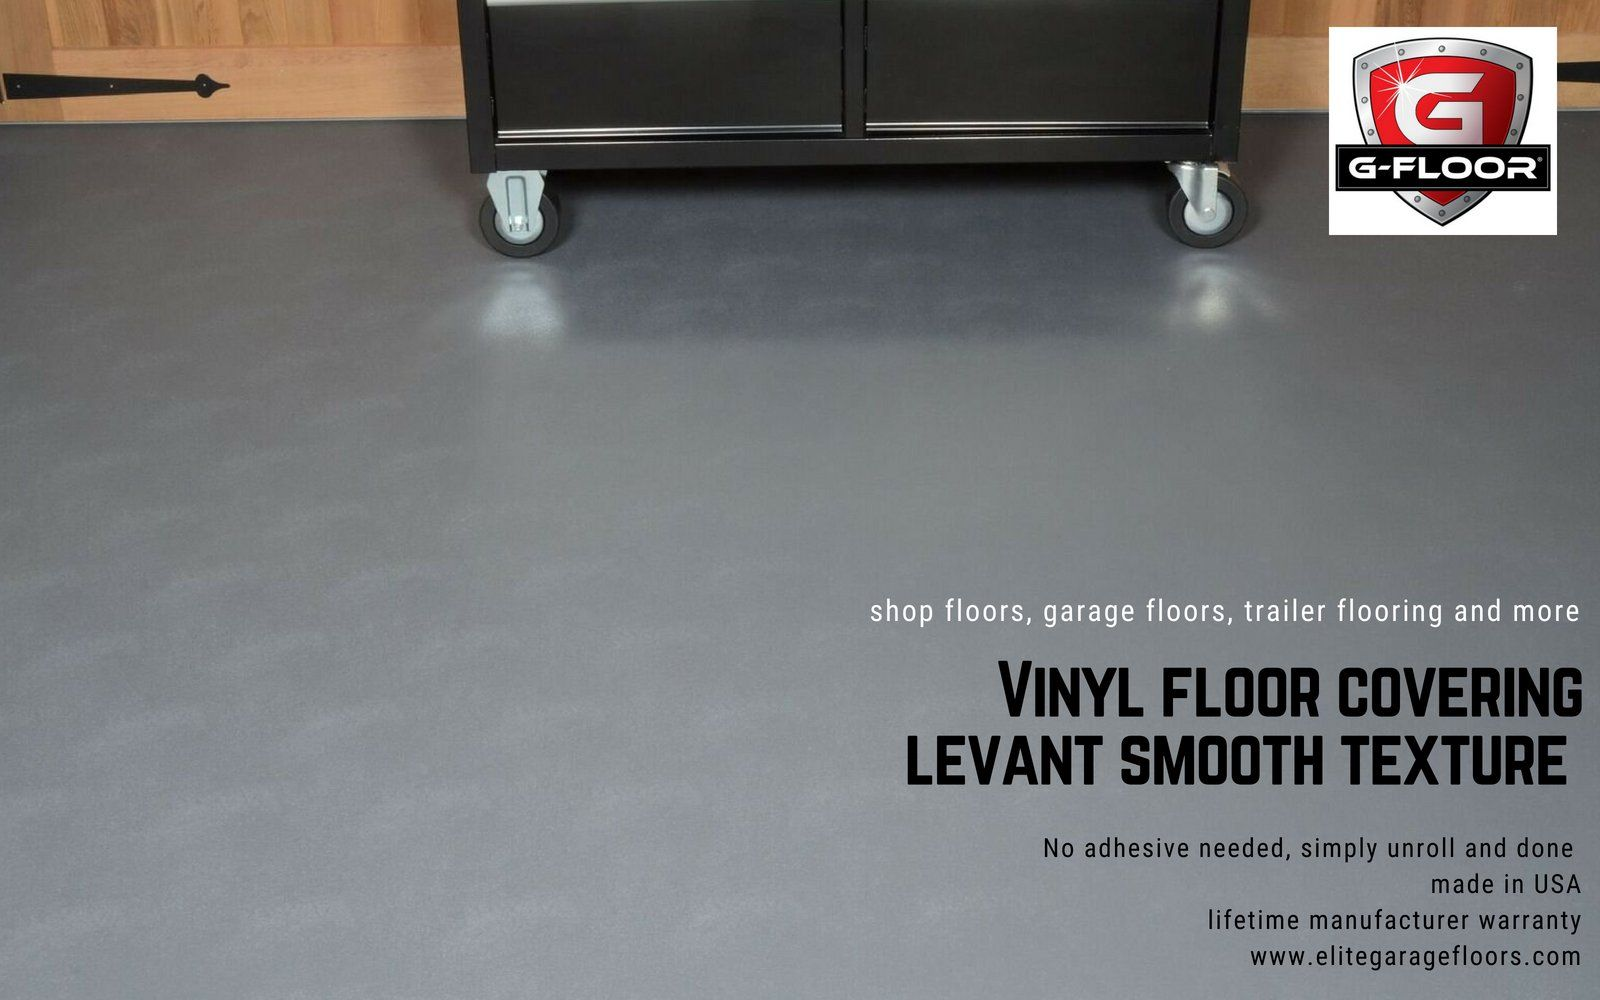 G Floor Vinyl Roll Out Flooring In Smooth Texture Levant Pattern Slate Grey Made In Usa Easy Diy Install Simply Un Vinyl Floor Covering G Floor Flooring